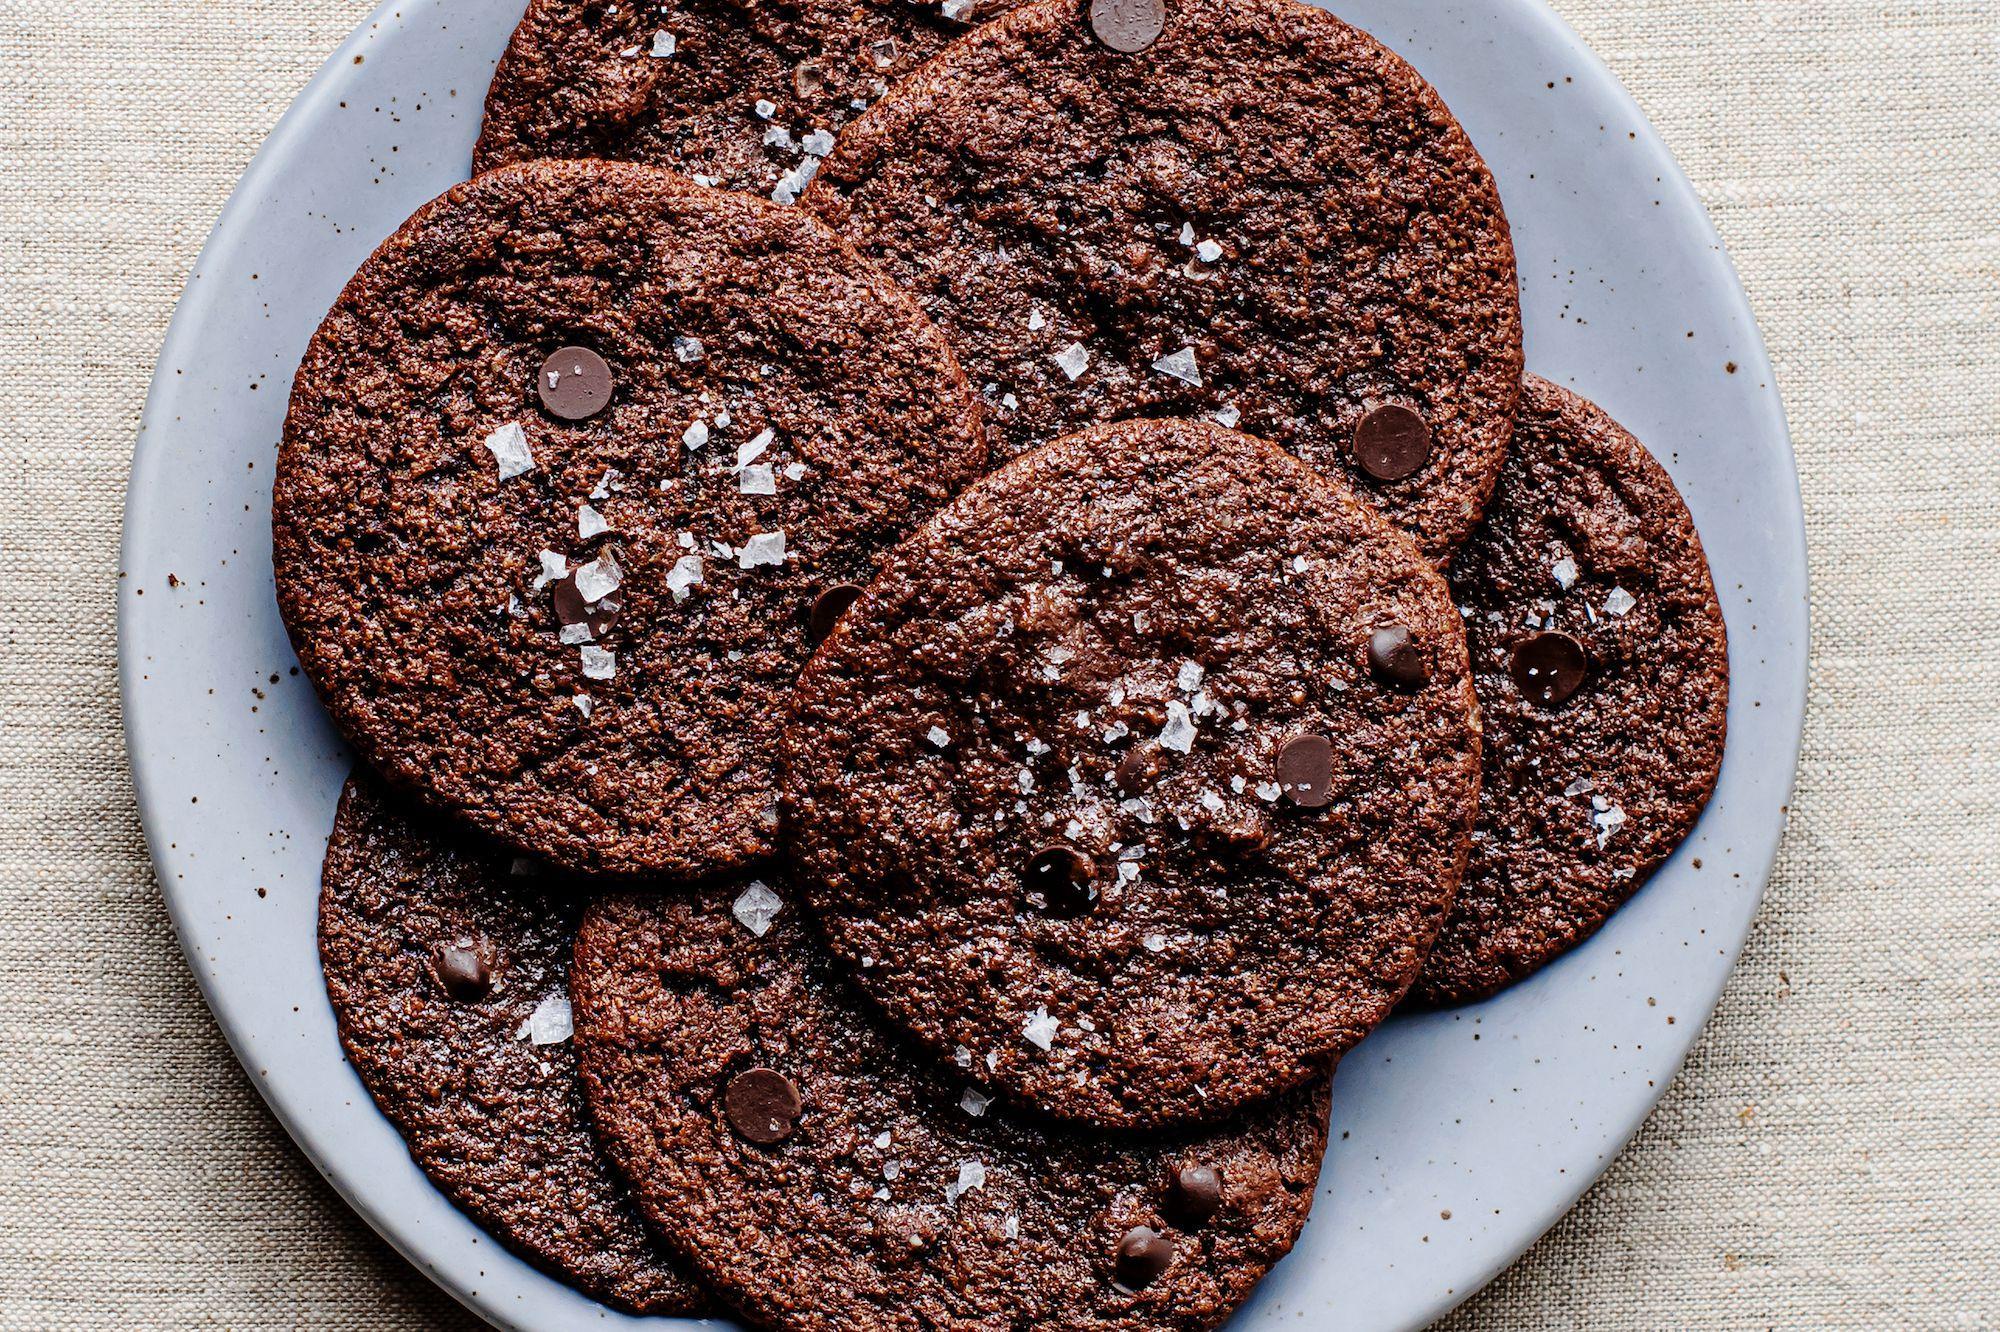 14 Best Sugar-Free, Low-Carb Keto Dessert Recipes